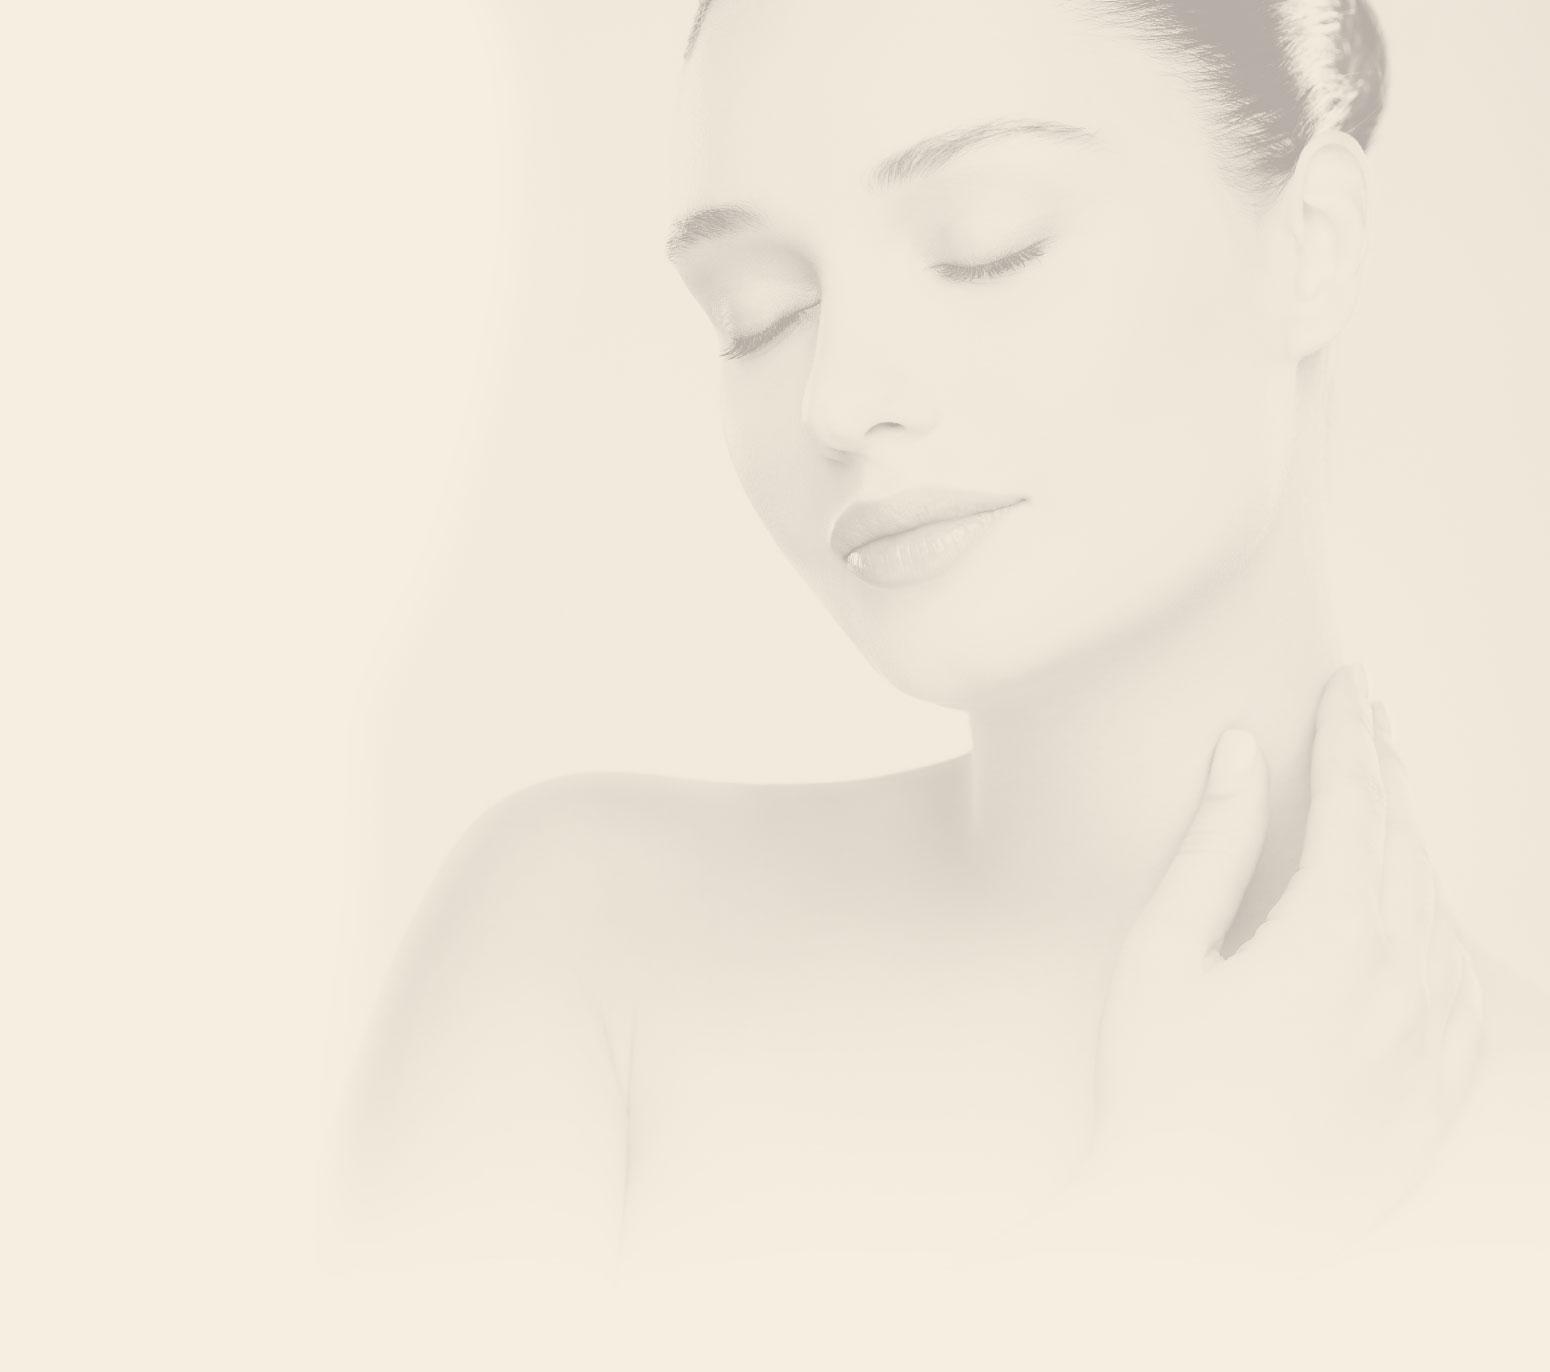 liposuction - Abdominoplastie - Liposuccion - Breast Lift - breast implants - redrapage mammaire - augmentation mammaire - chirurgie des seins - Blépharoplastie- implants mammaires